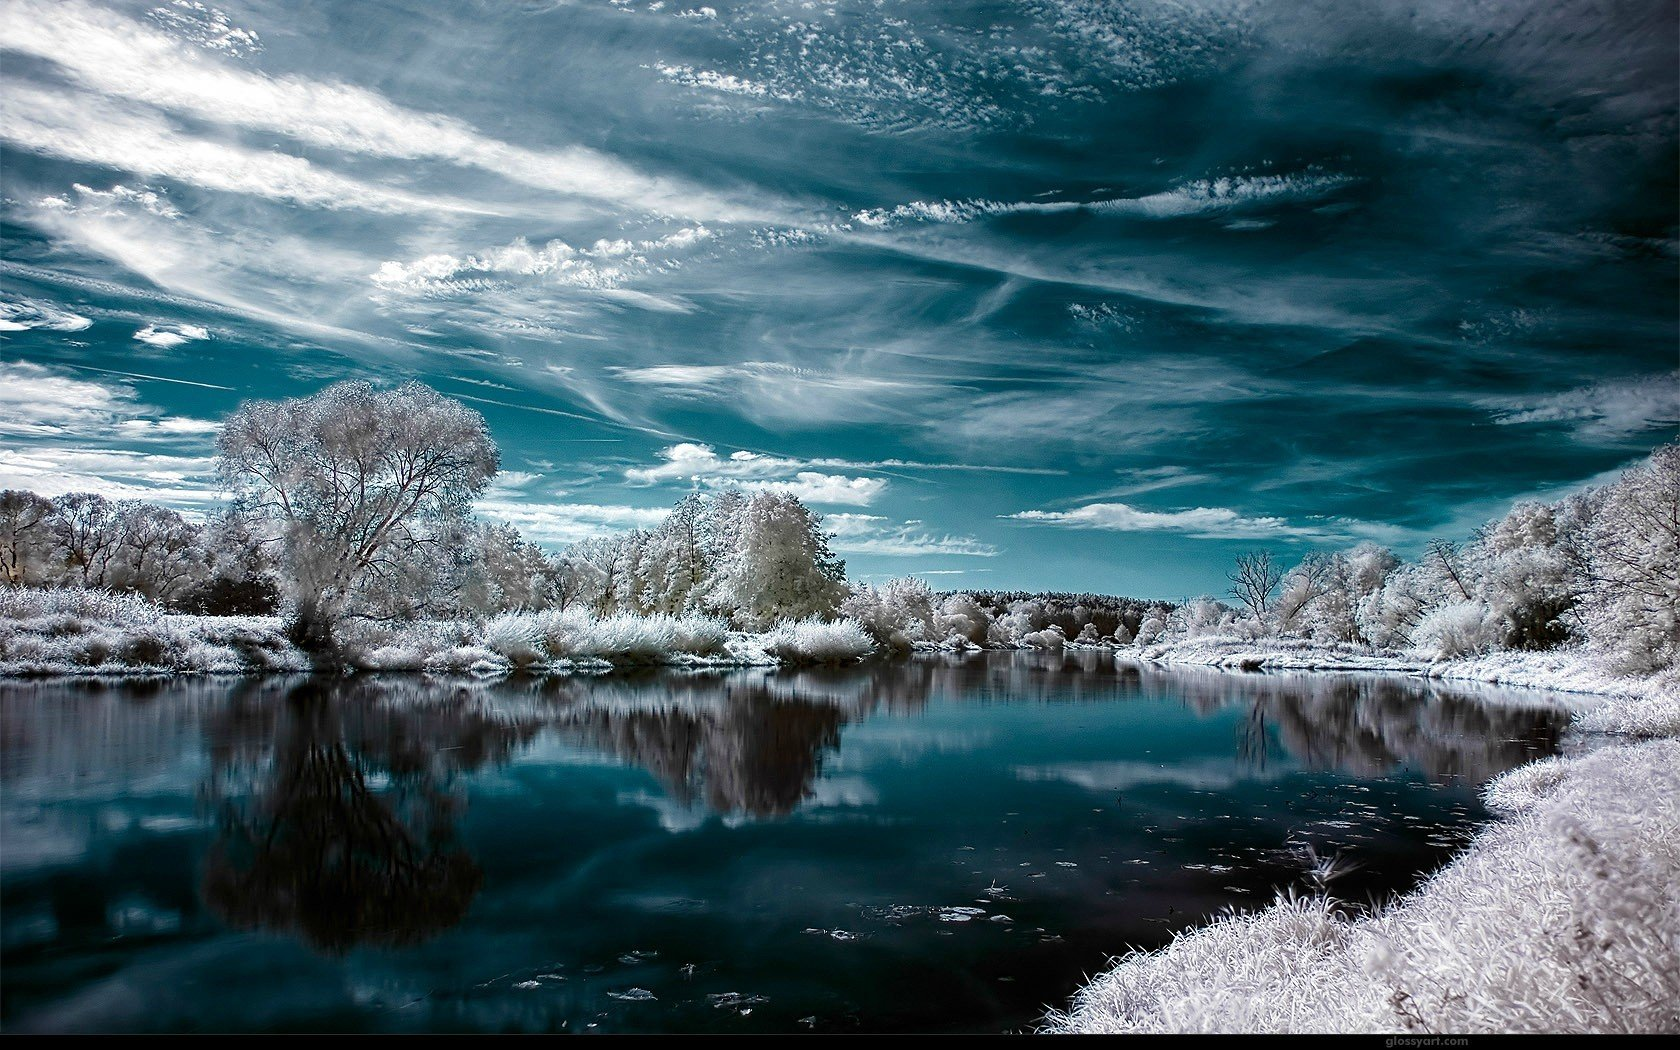 1080p High Definition Wallpapers For Desktop 197